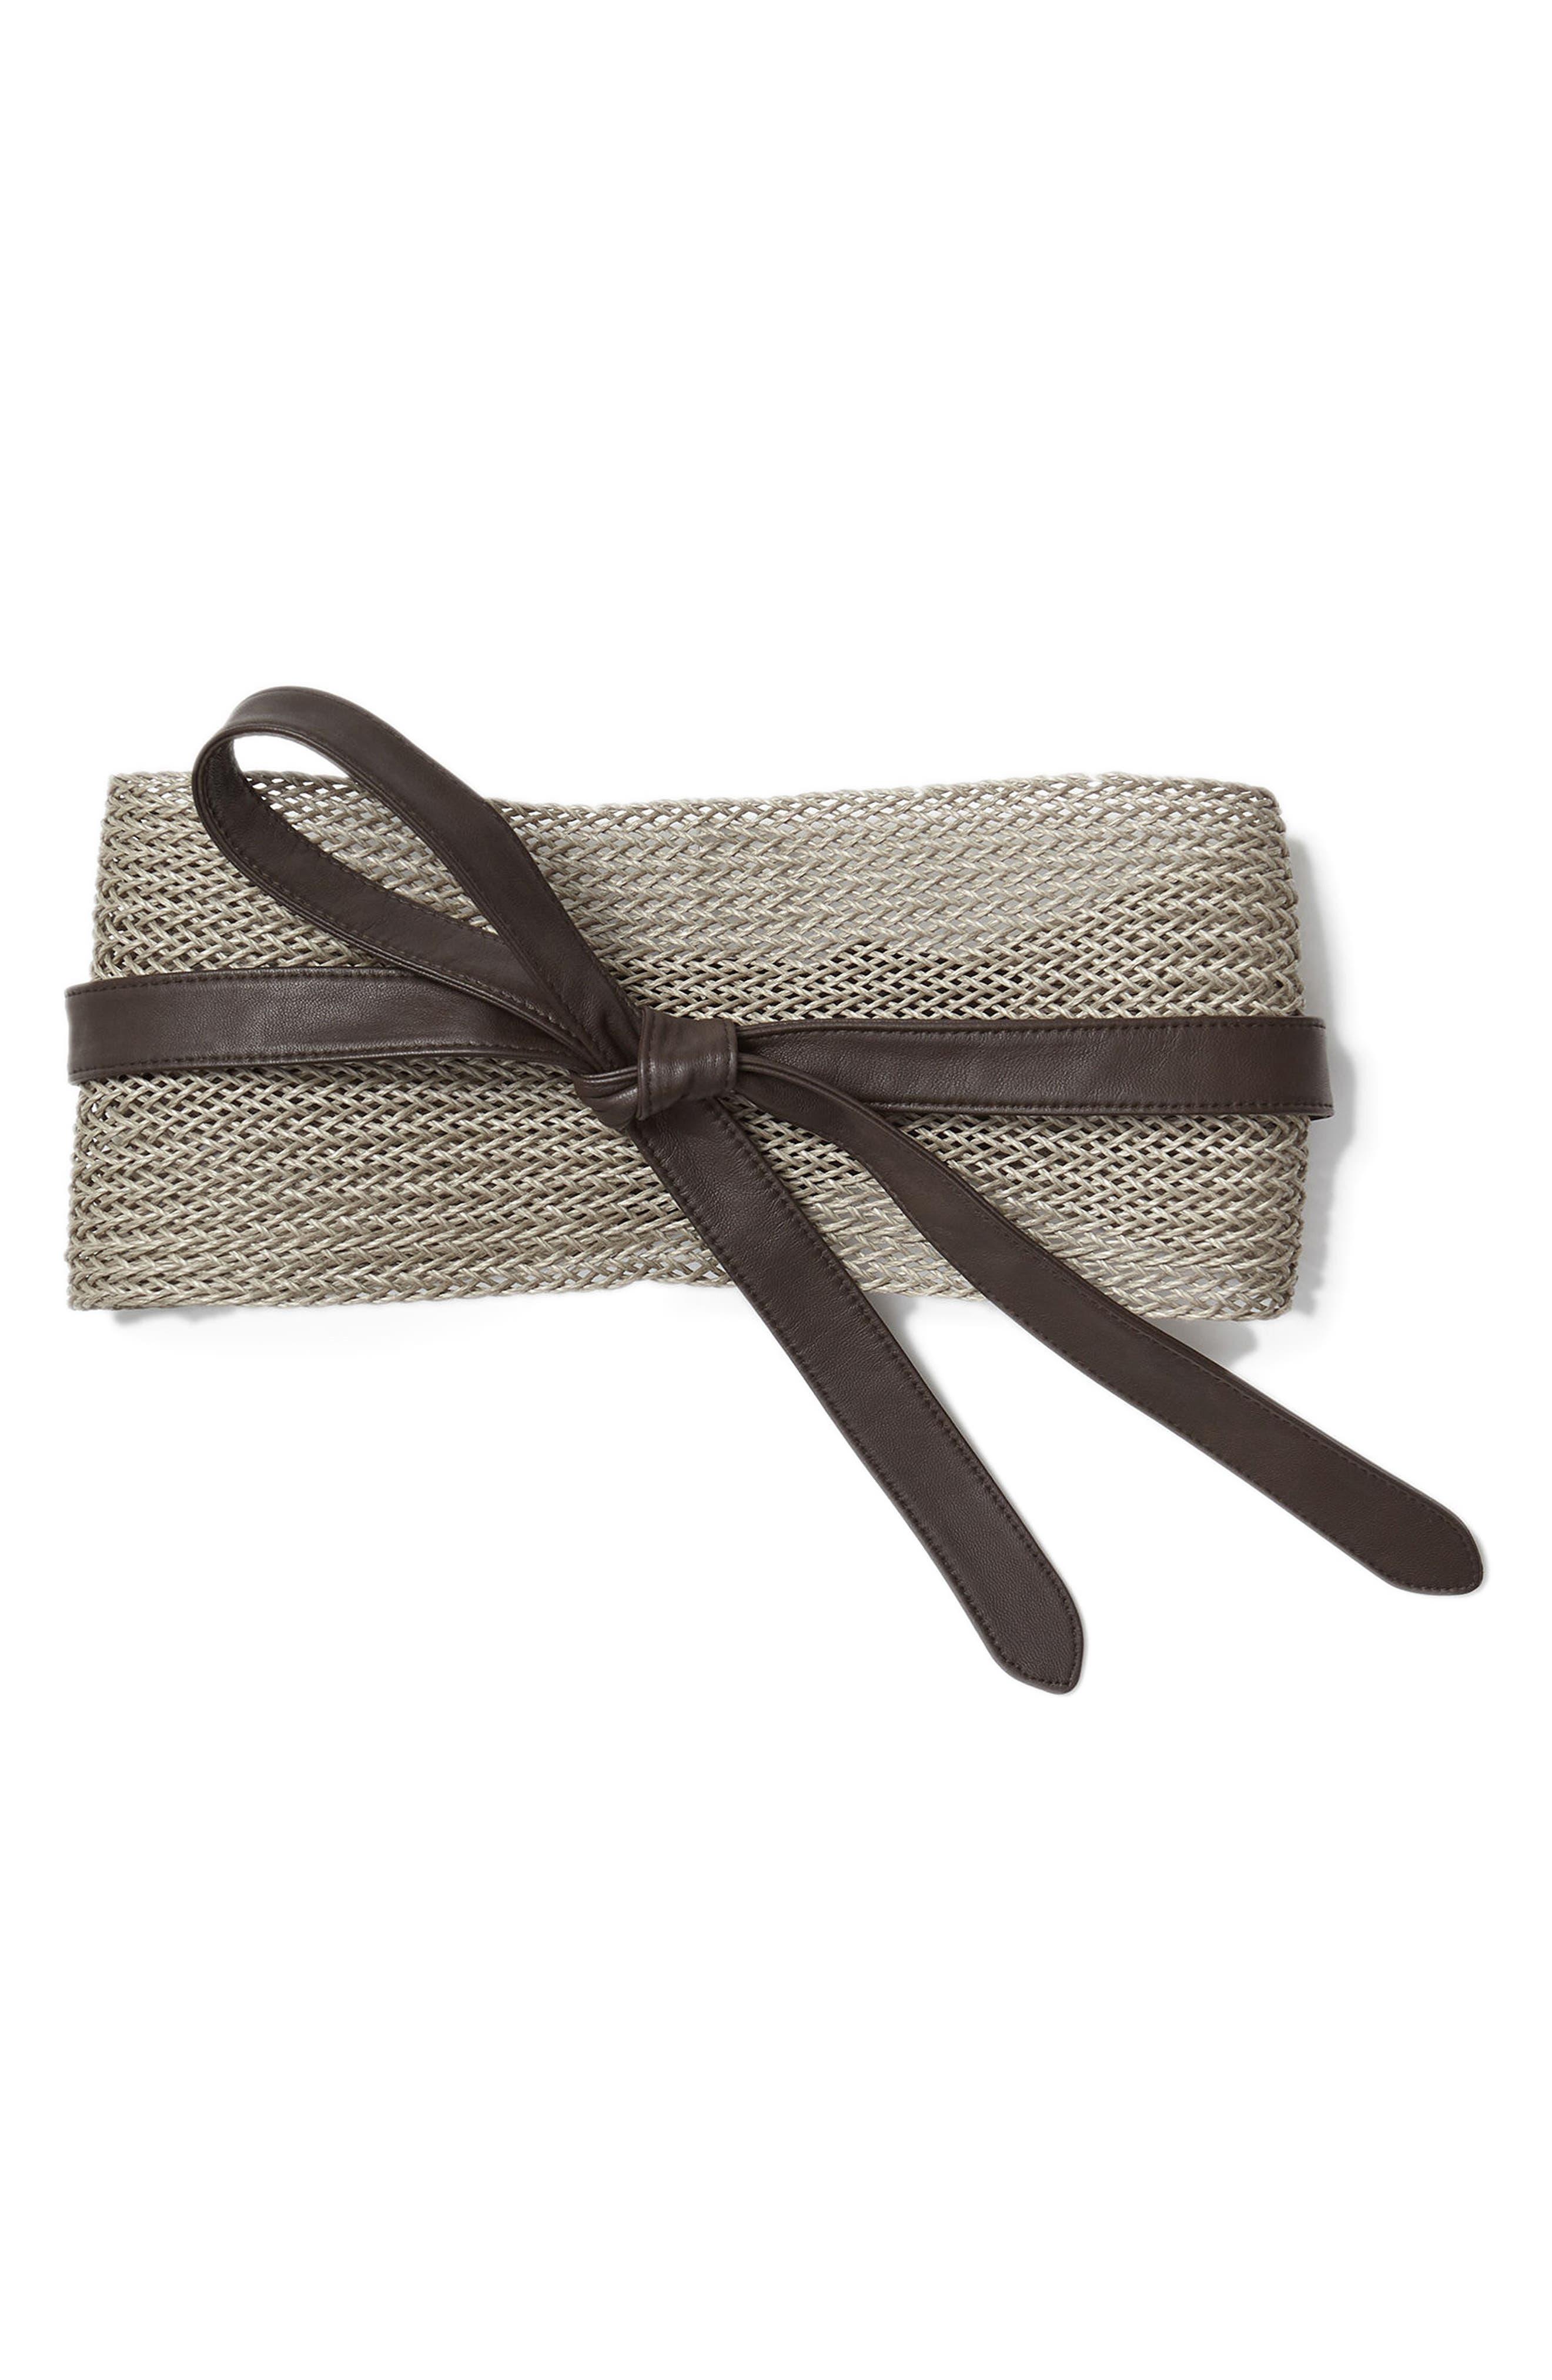 Obi Linen & Leather Belt,                             Main thumbnail 1, color,                             Nightingale